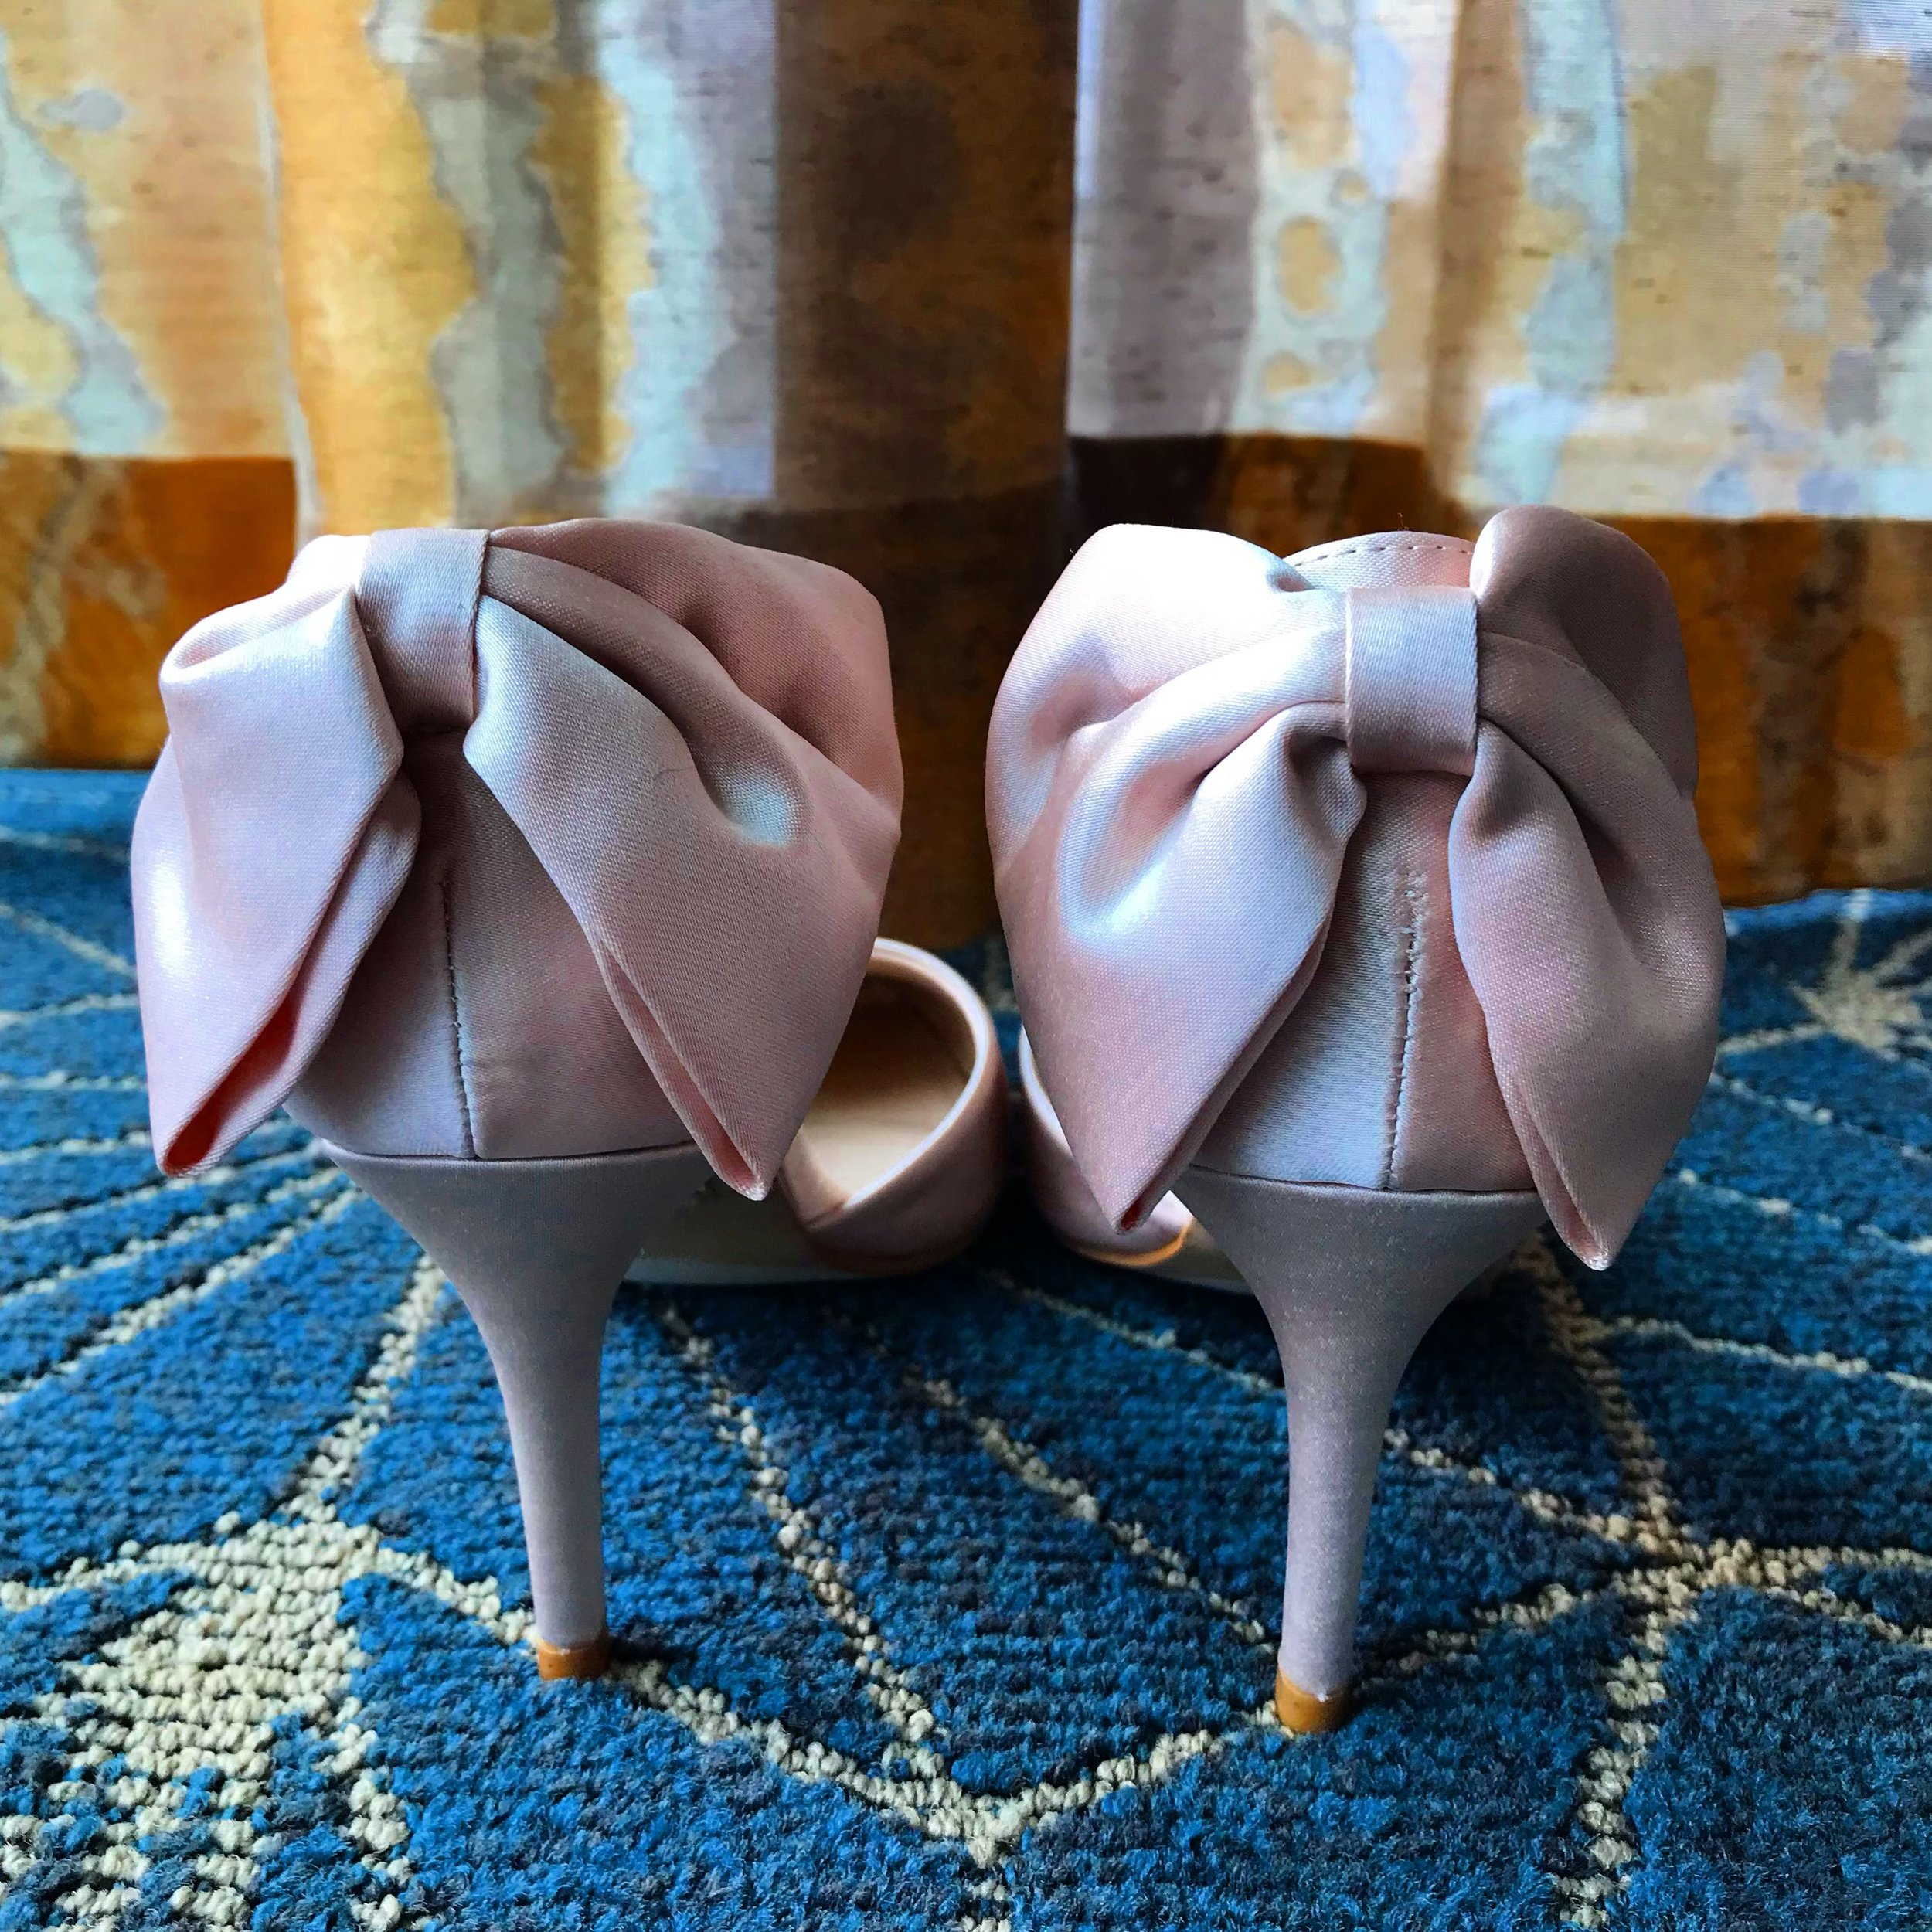 Three Heel Clicks - What to Wear this Year to NYE (21).jpg